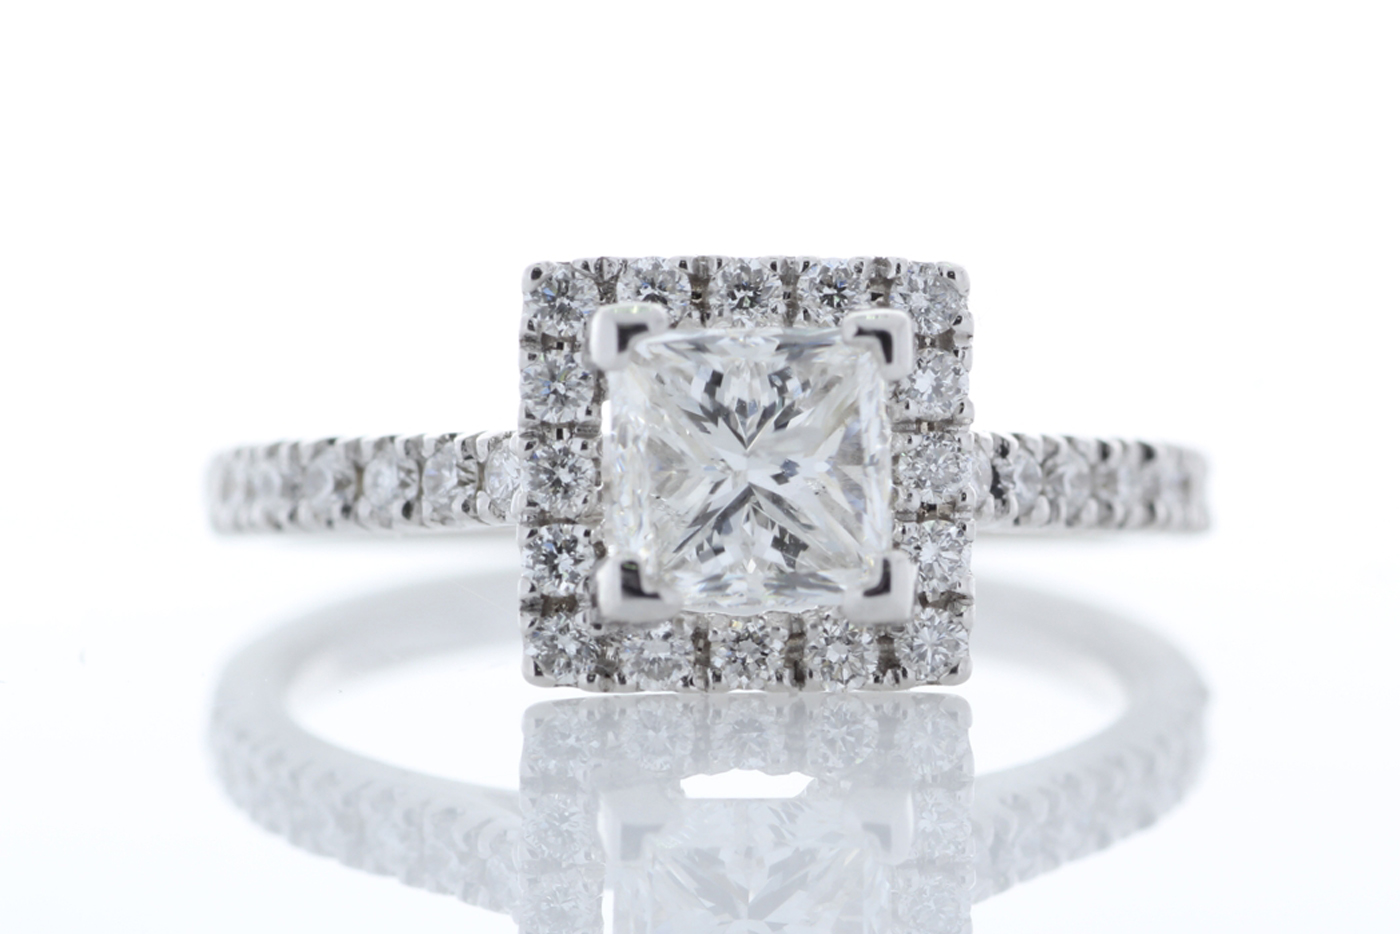 Lot 31 - 18ct White Gold Halo Set Princess Cut Diamond Ring 1.36 Carats